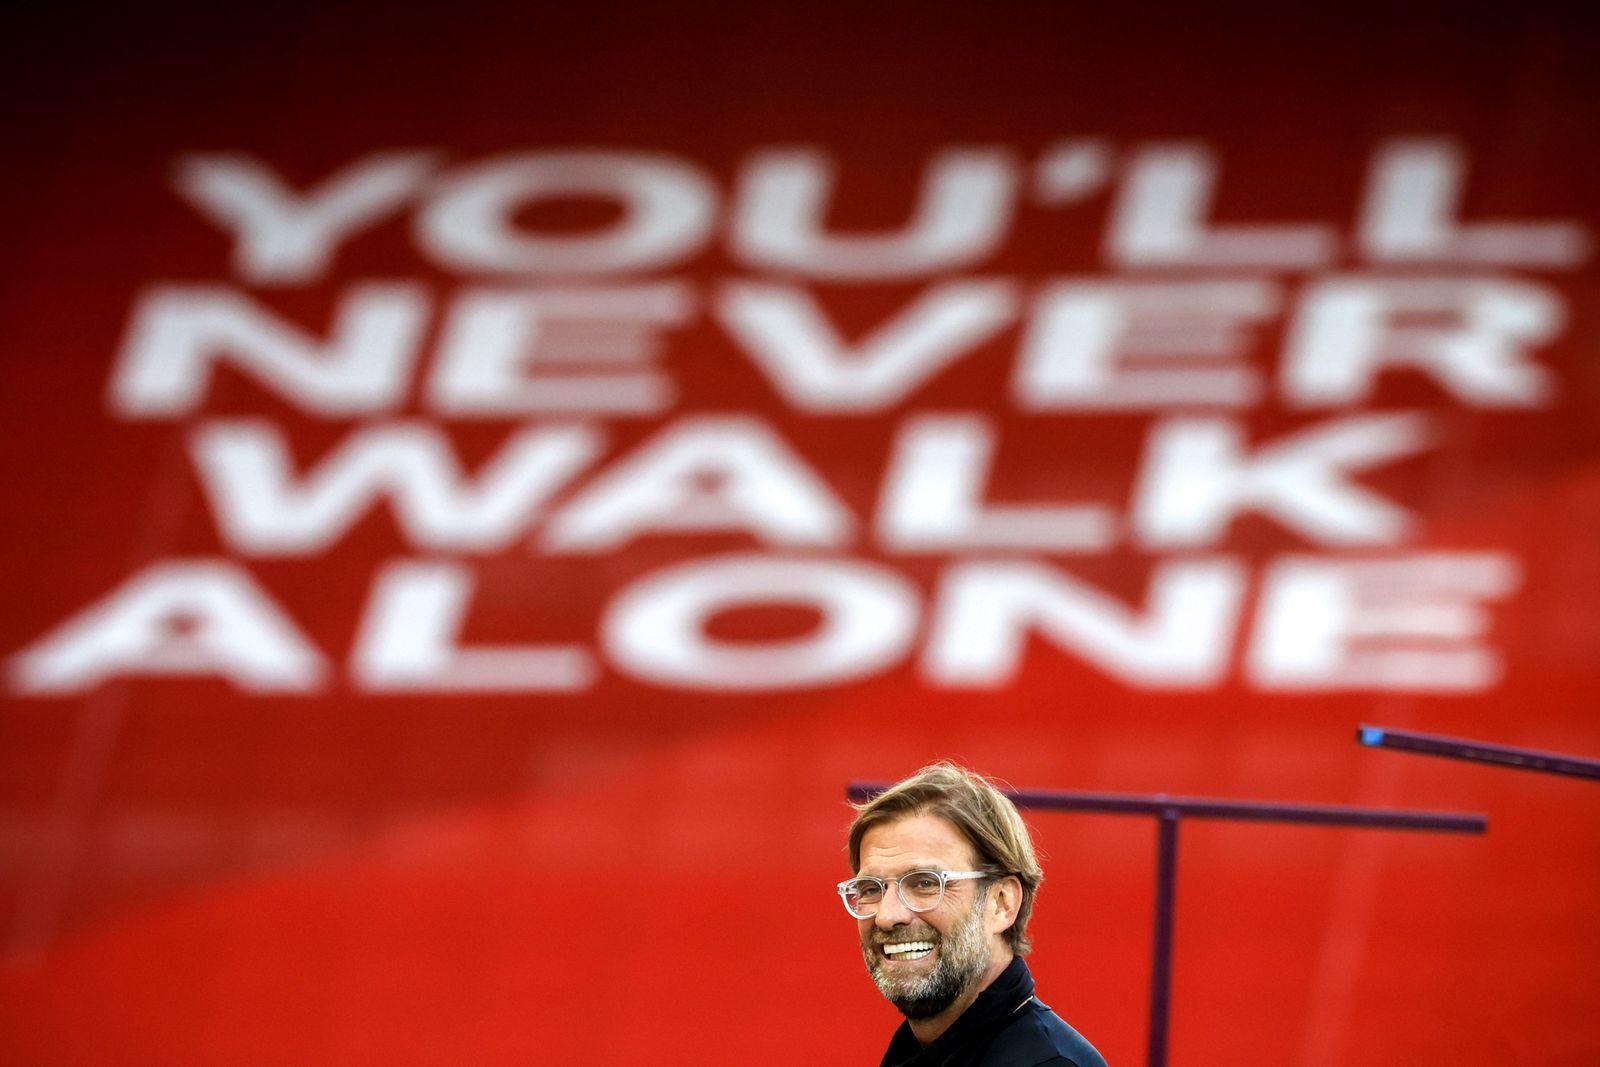 Liverpool FC vs Crystal Palace, United Kingdom - 24 Jun 2020